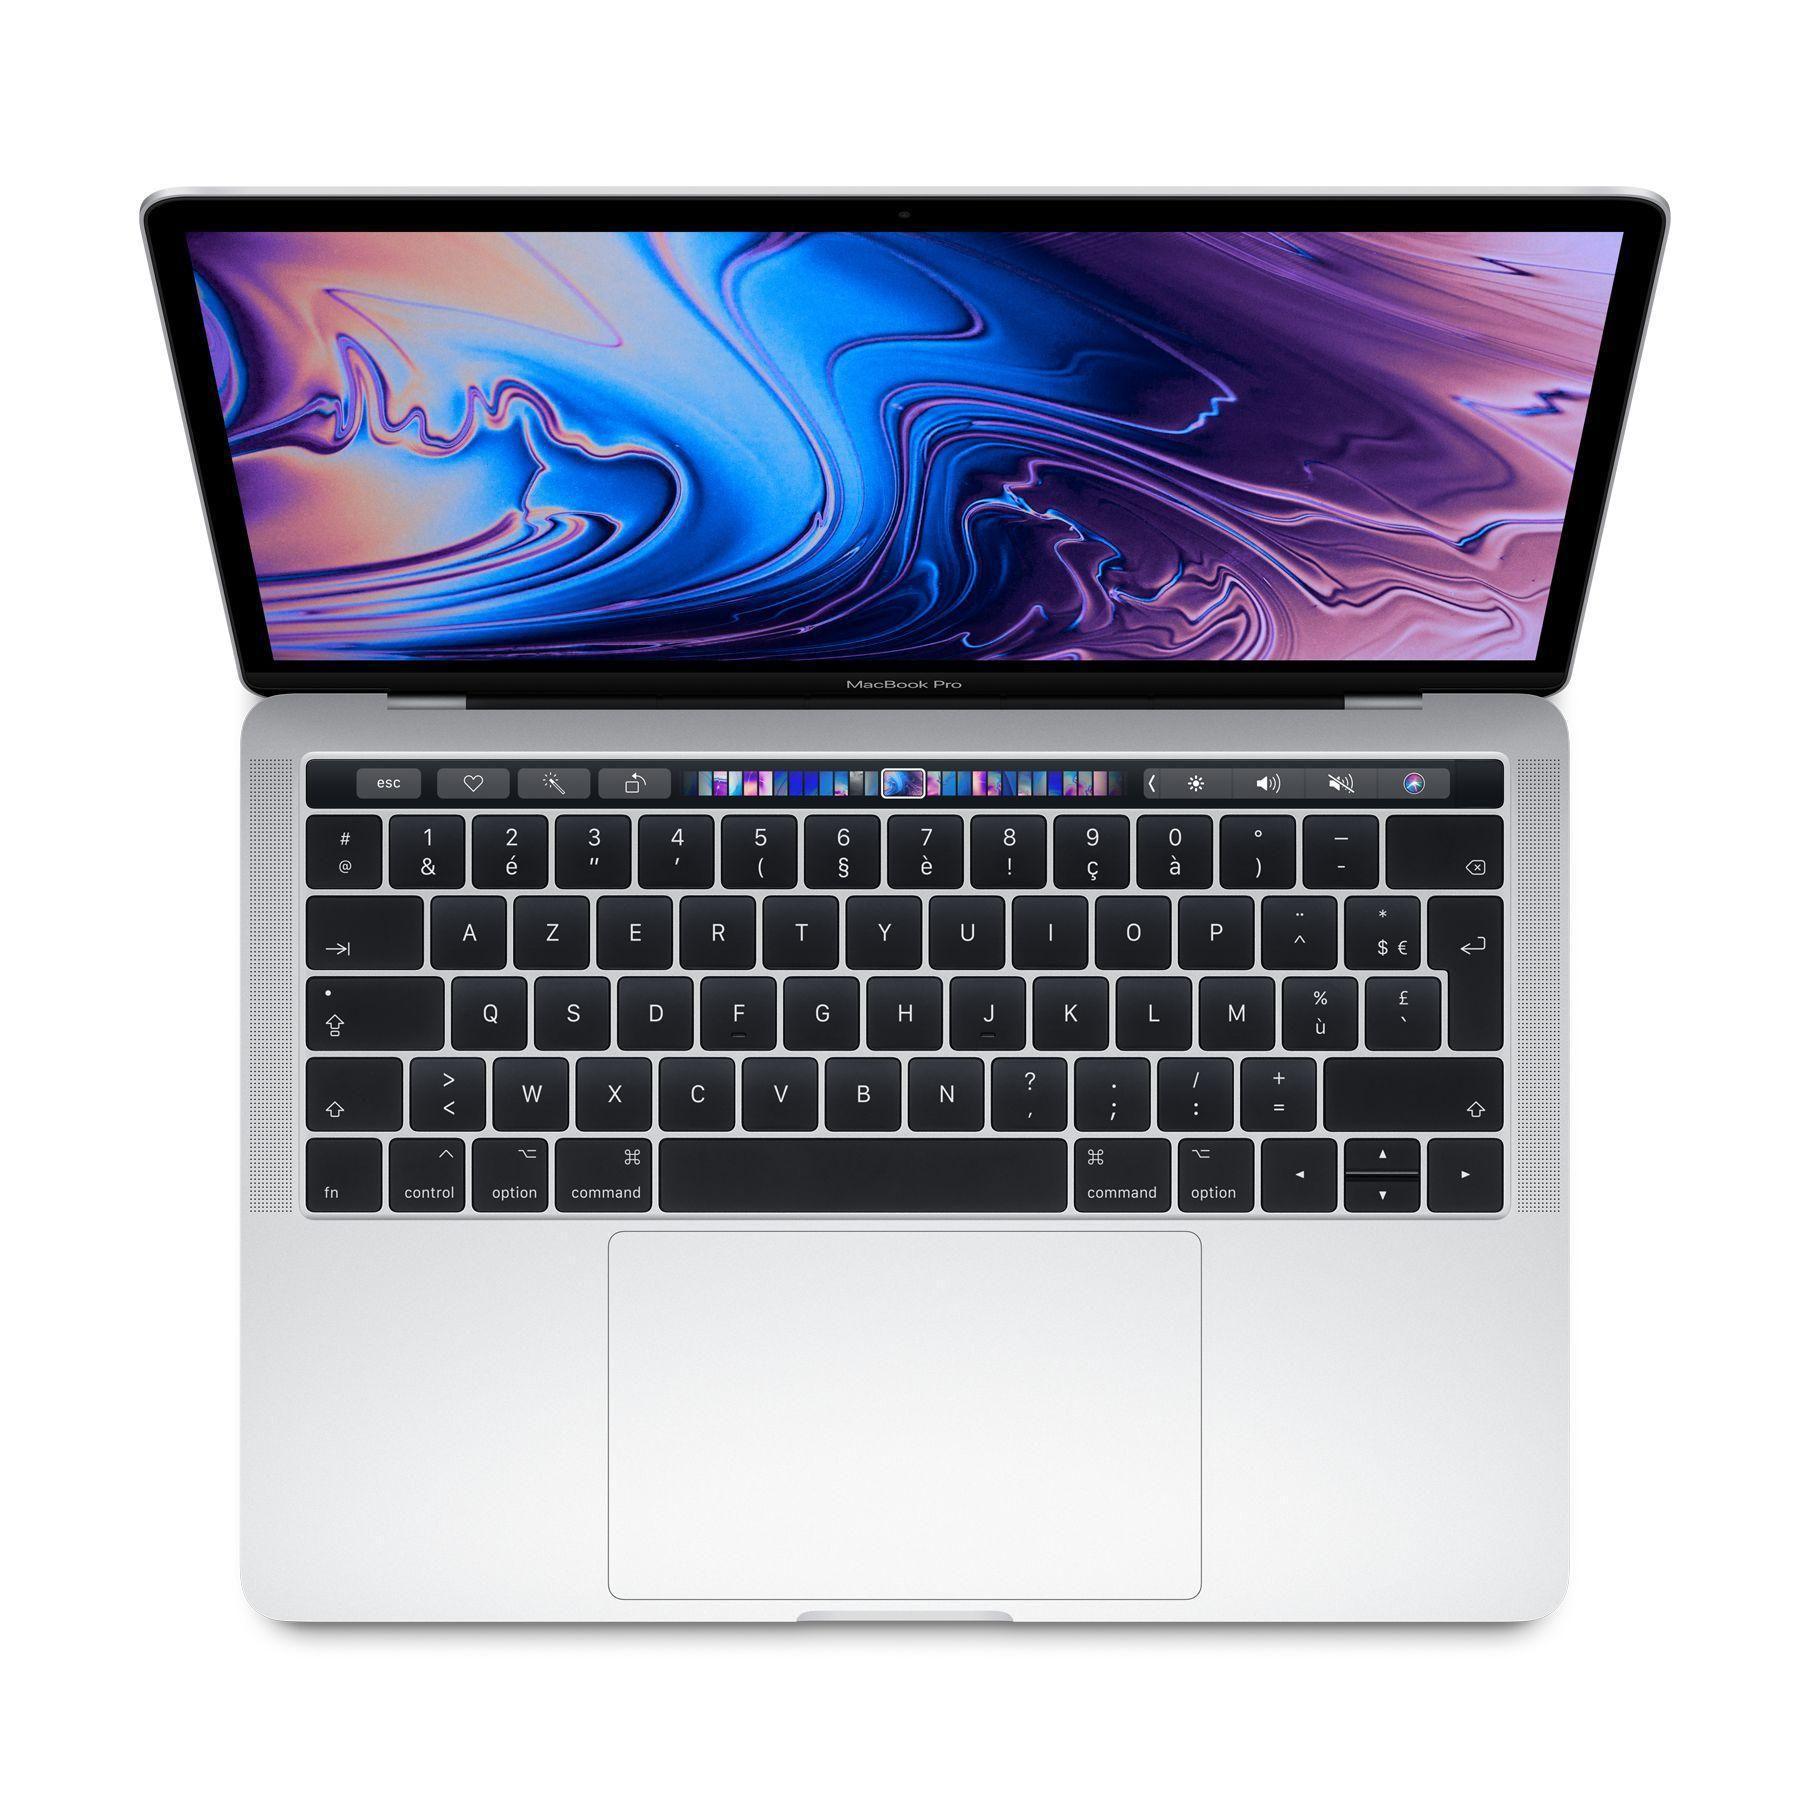 Macbook Pro Retina 13 3 Inch Mid 2017 Core I5 8gb Ssd 256 Gb Refurbished In 2020 Buy Macbook Macbook Pro 13 Inch Apple Macbook Pro